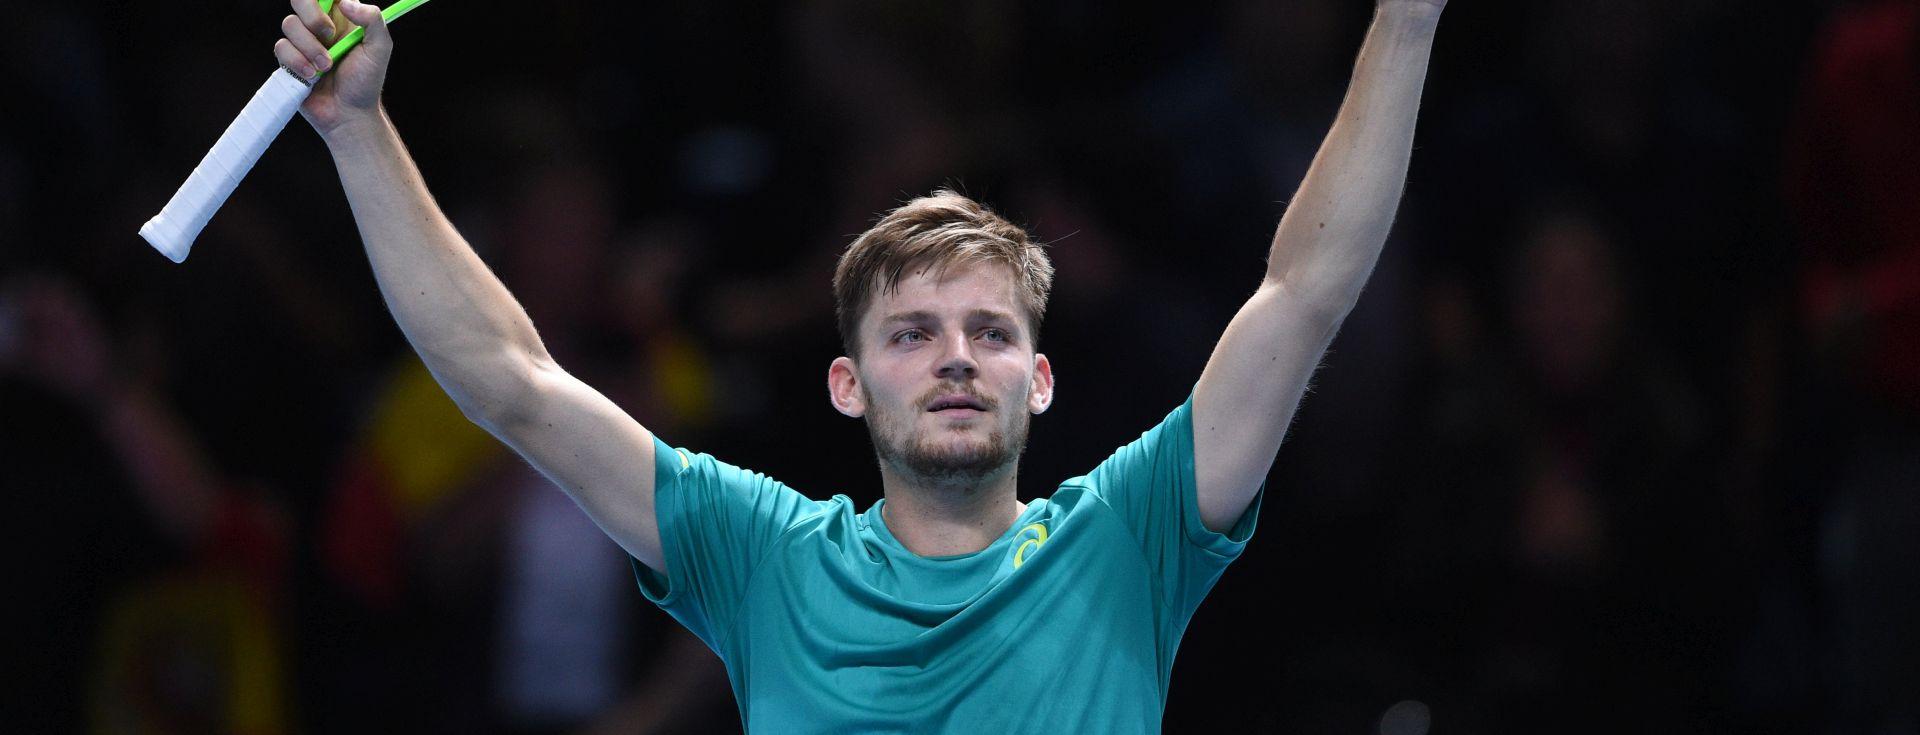 ATP FINALS Goffin 'iznenadio' Federera i plasirao se u finale